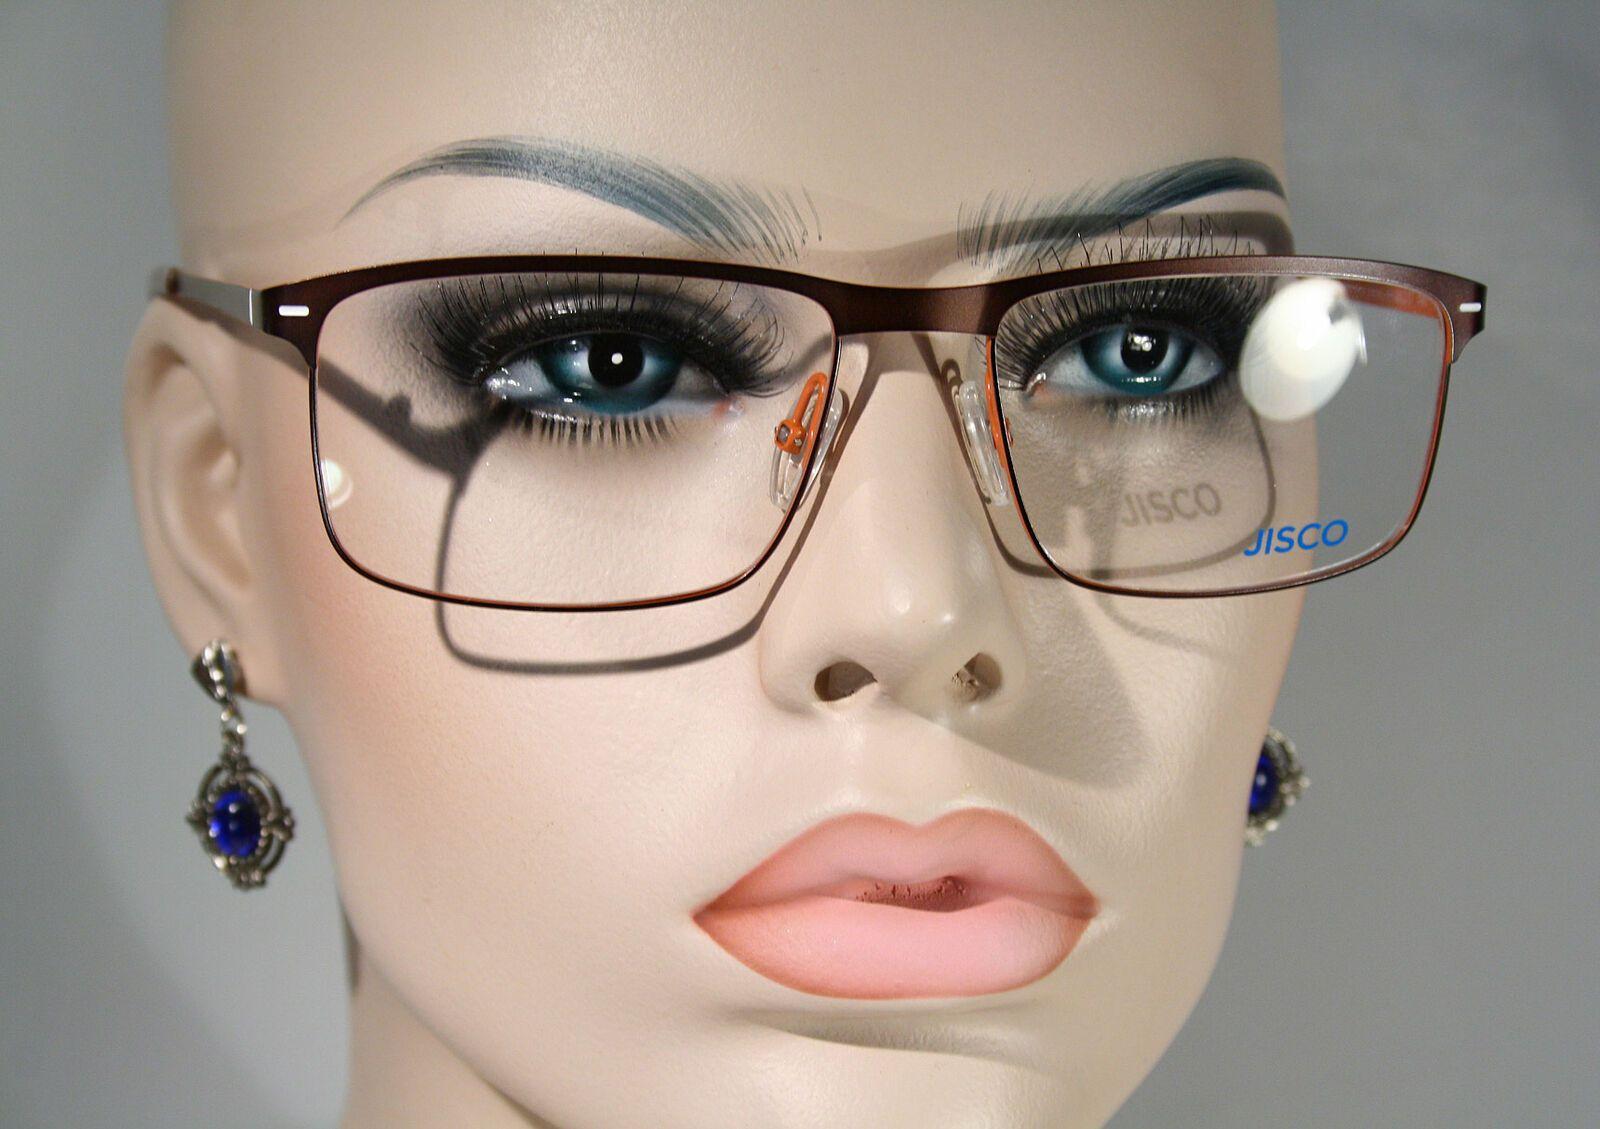 New Jisco Blau Unisex Contemporary Brown Size Large Eyeglasses Frames Glasses Eyeglasses Frames Eyeglasses Unisex